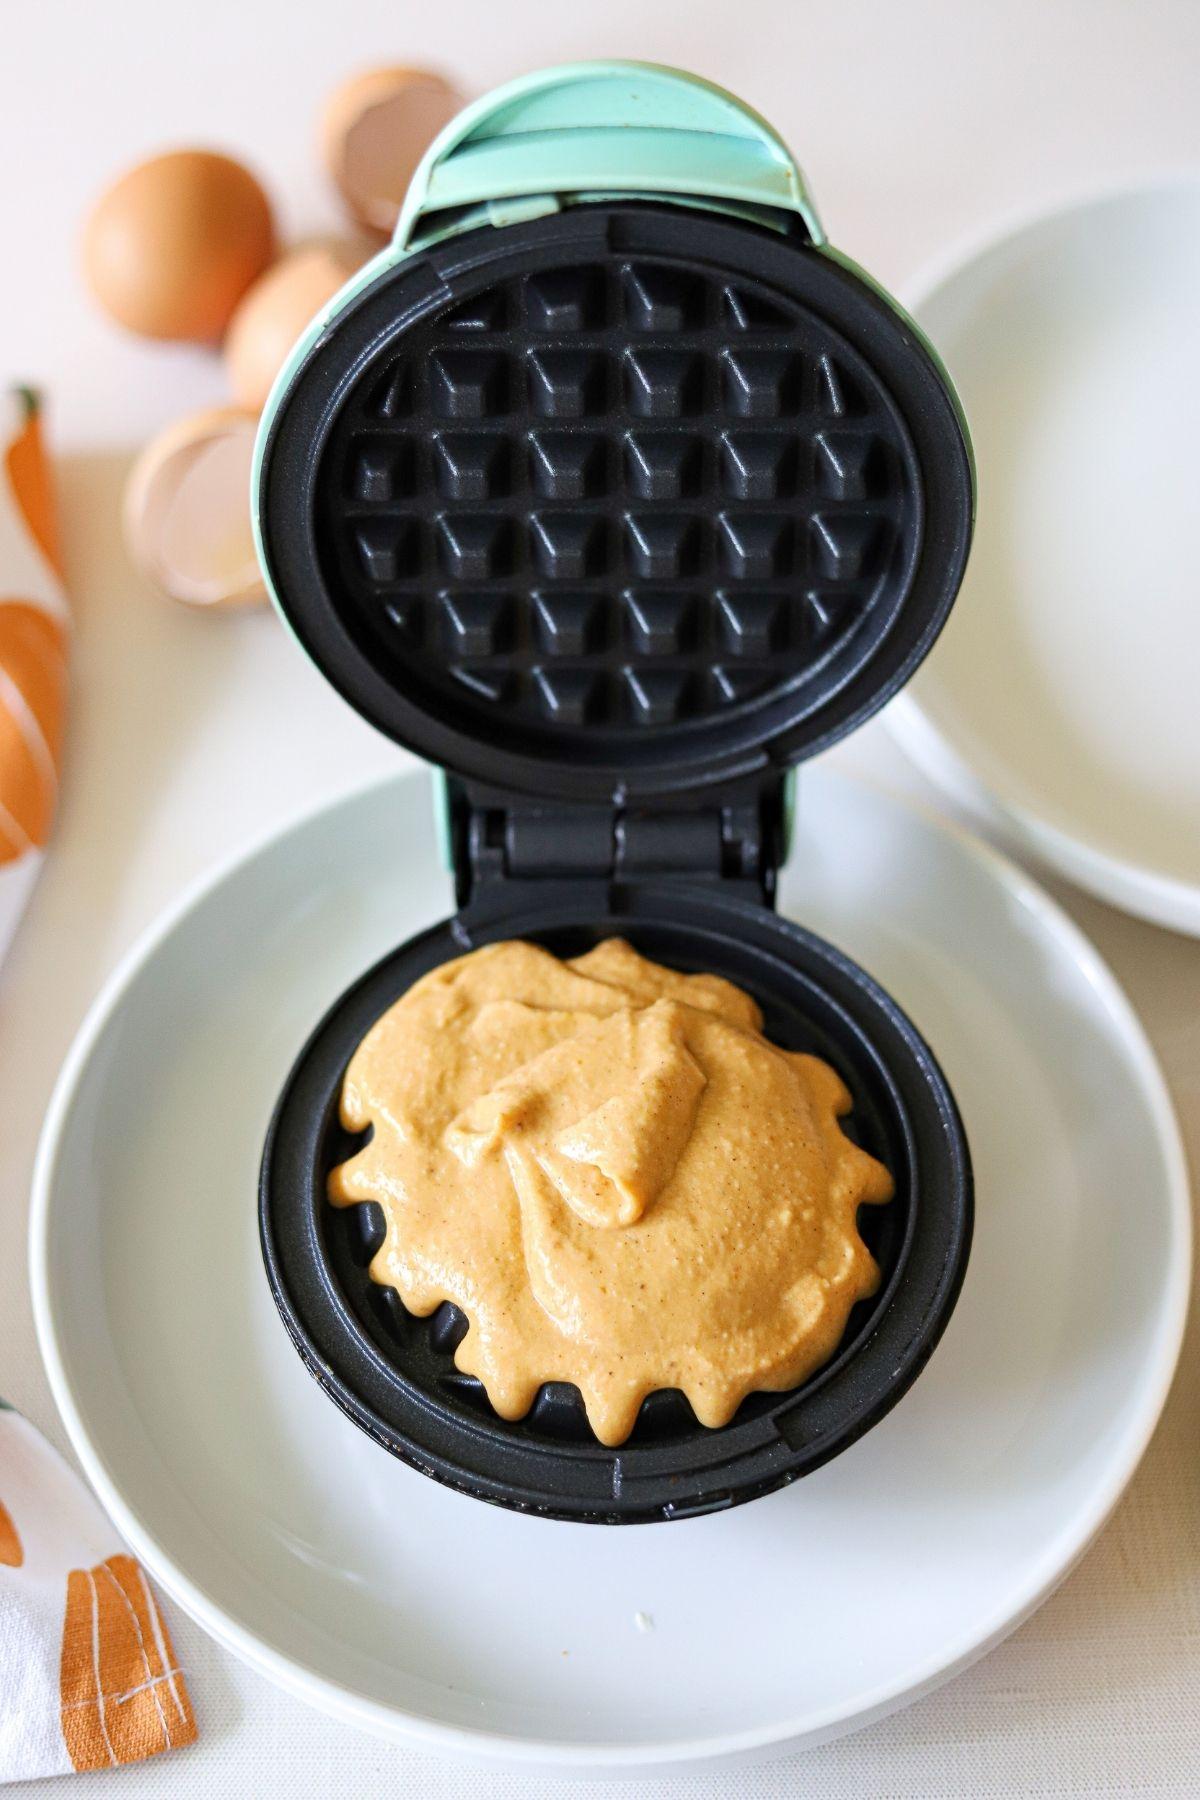 Pumpkin waffle batter in a mini waffle maker